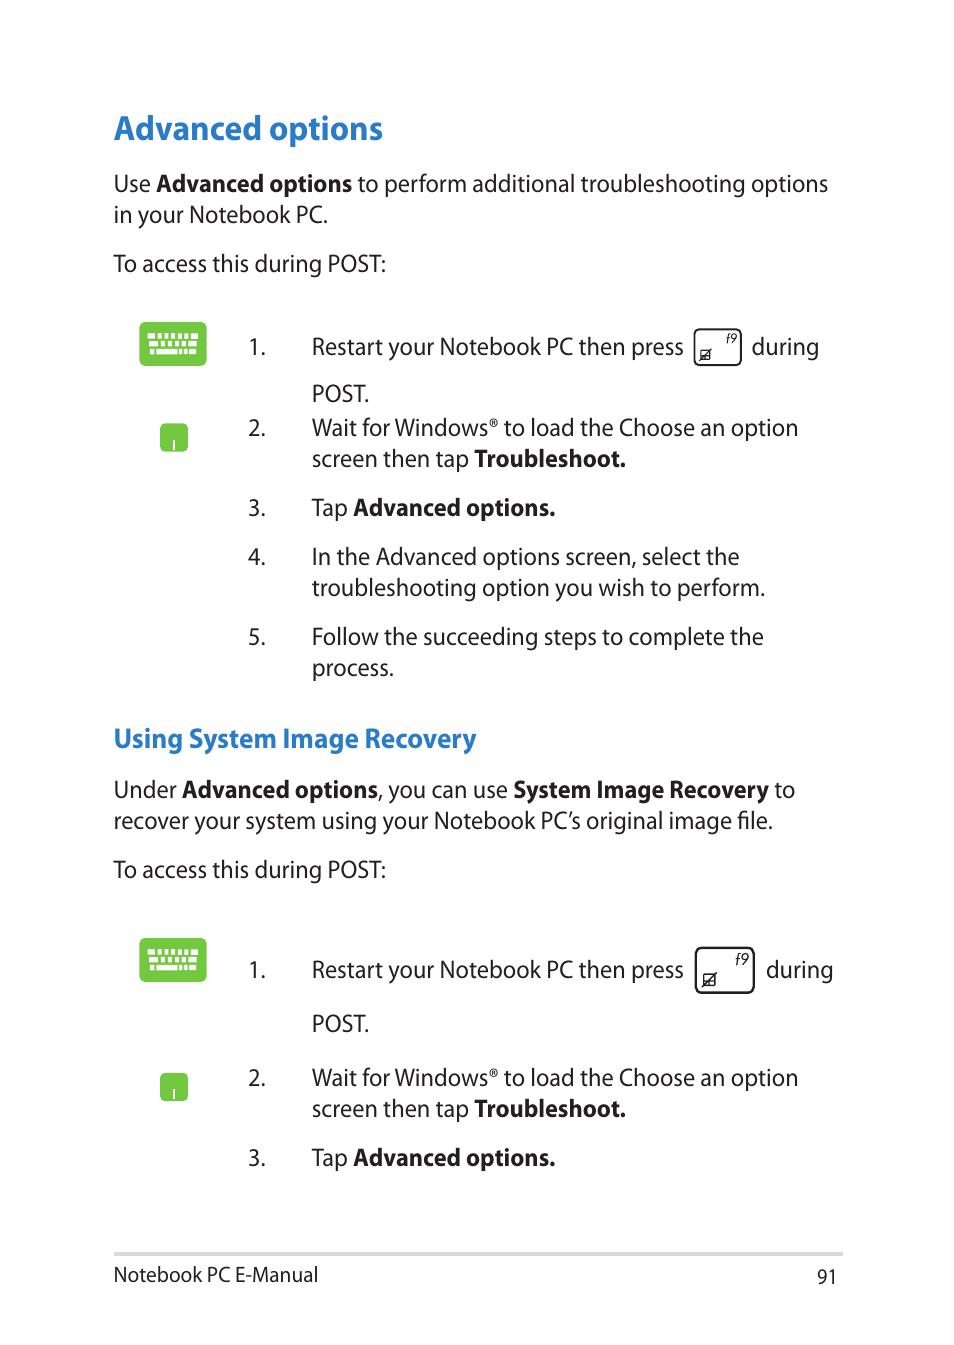 advanced options asus notebook pc e manual user manual page 91 rh manualsdir com asus eee pc 1018p user manual asus notebook pc user guide